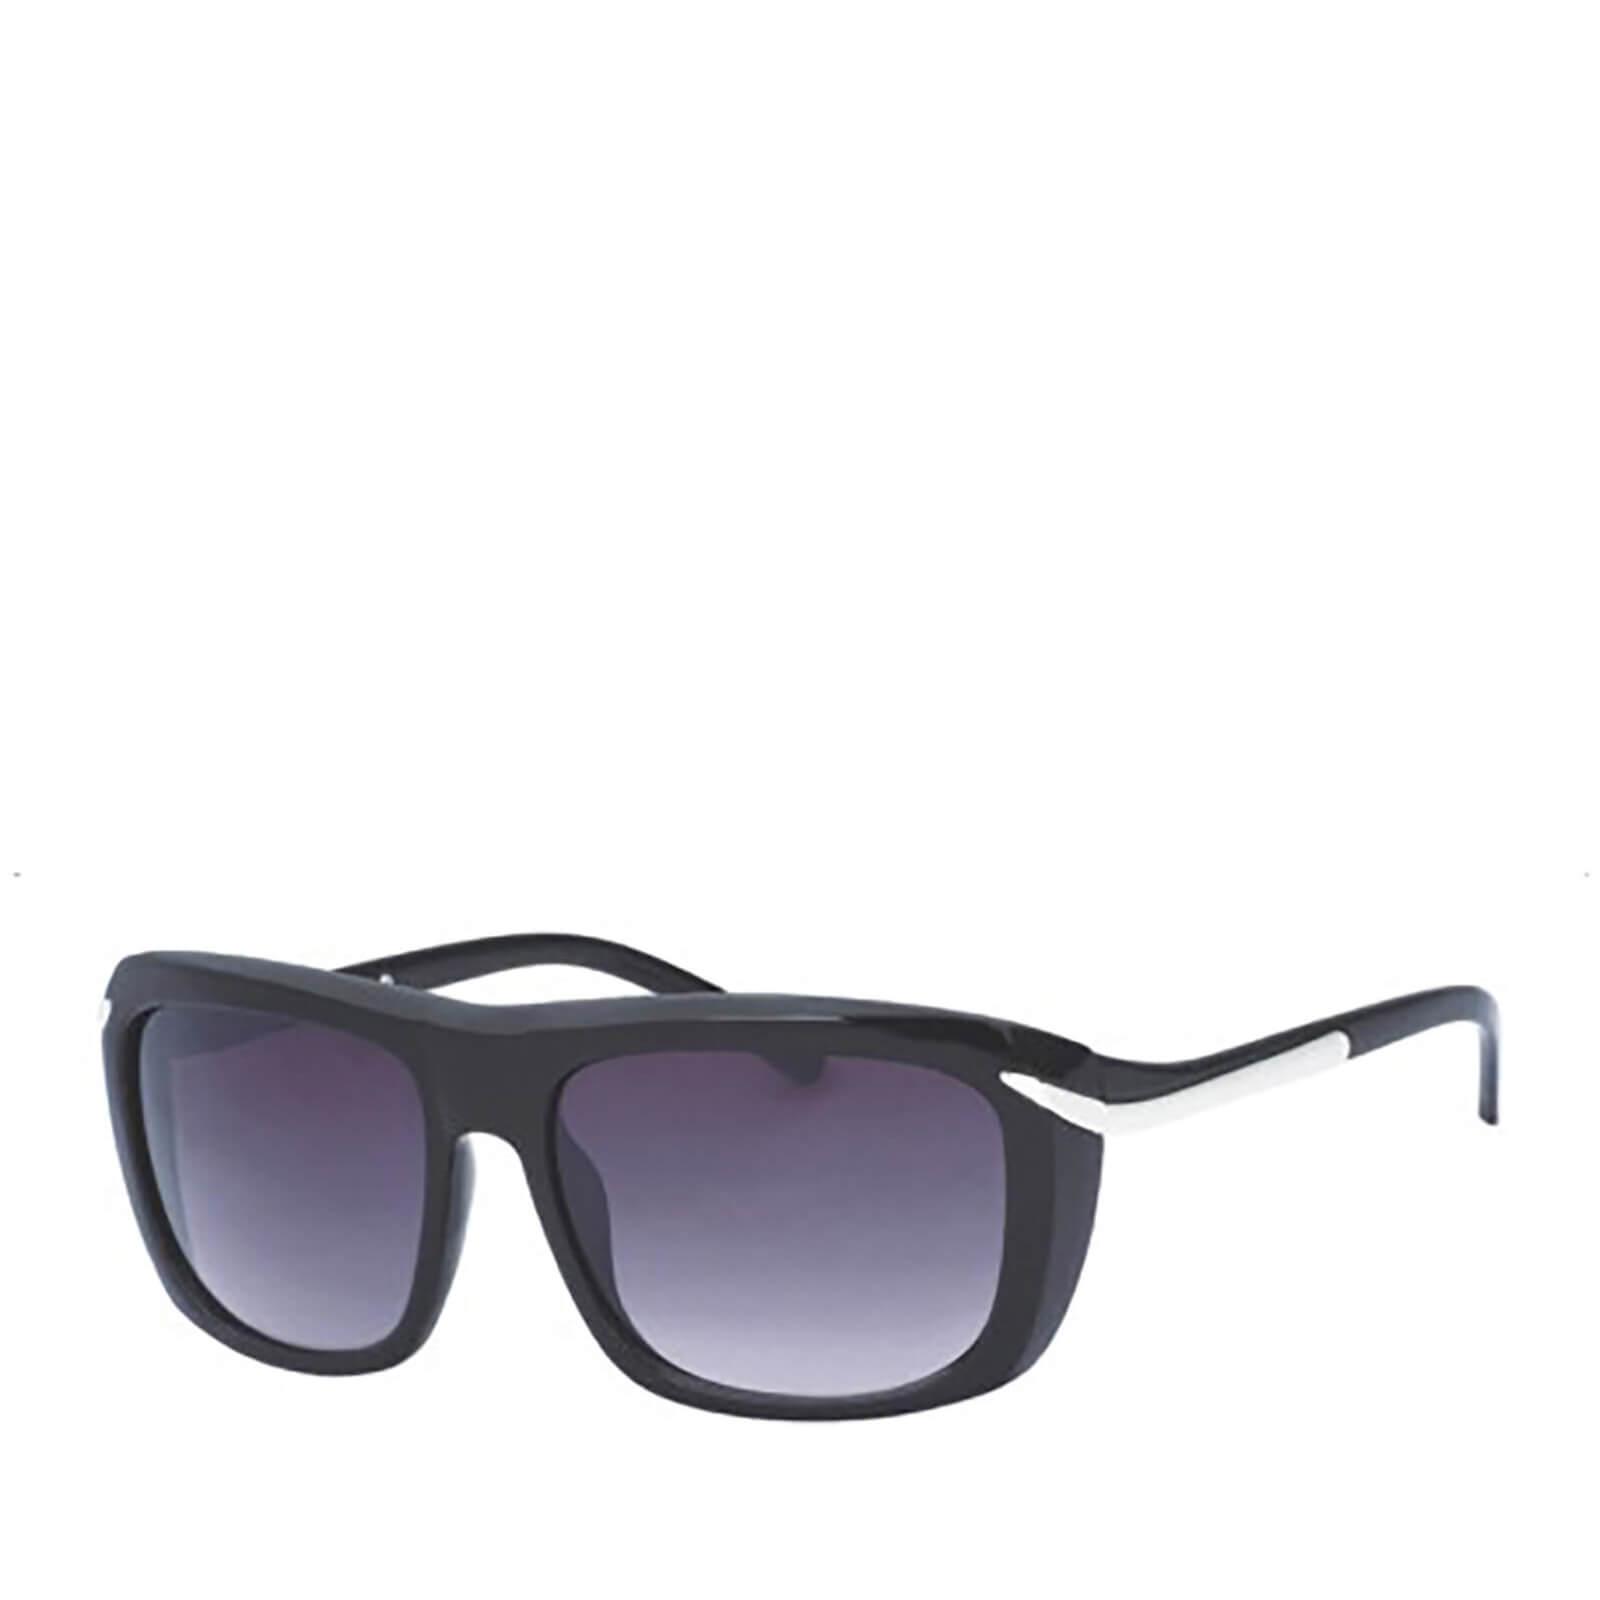 Own Brand Men's Square Sunglasses - Black